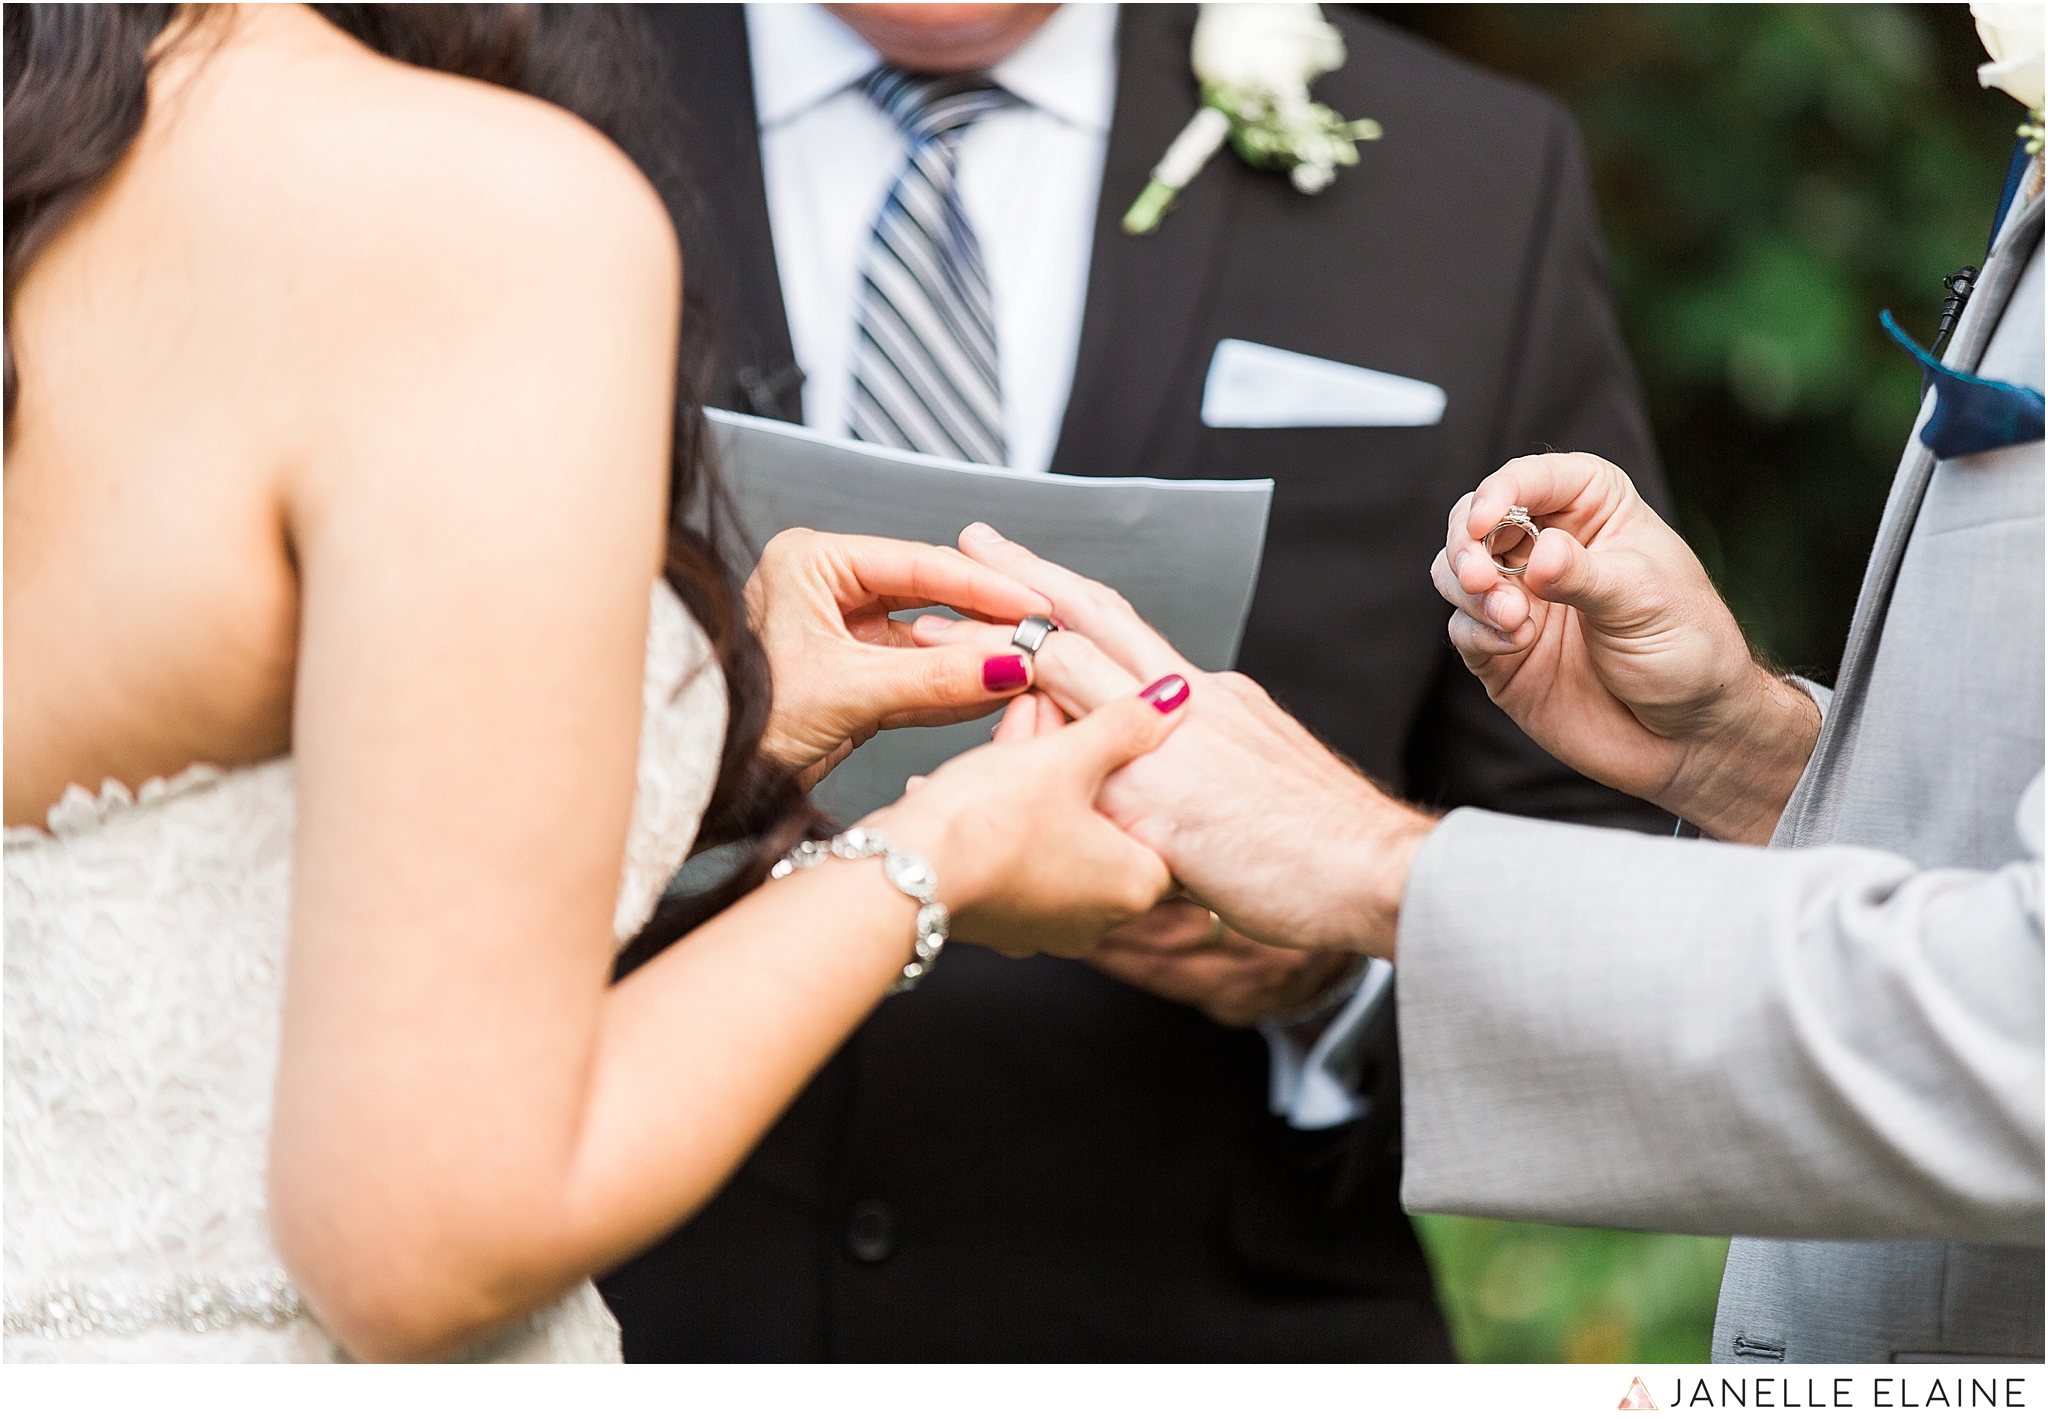 janelle elaine photography-professional wedding photographer-seattle-bellevue-robinswood house-169.jpg